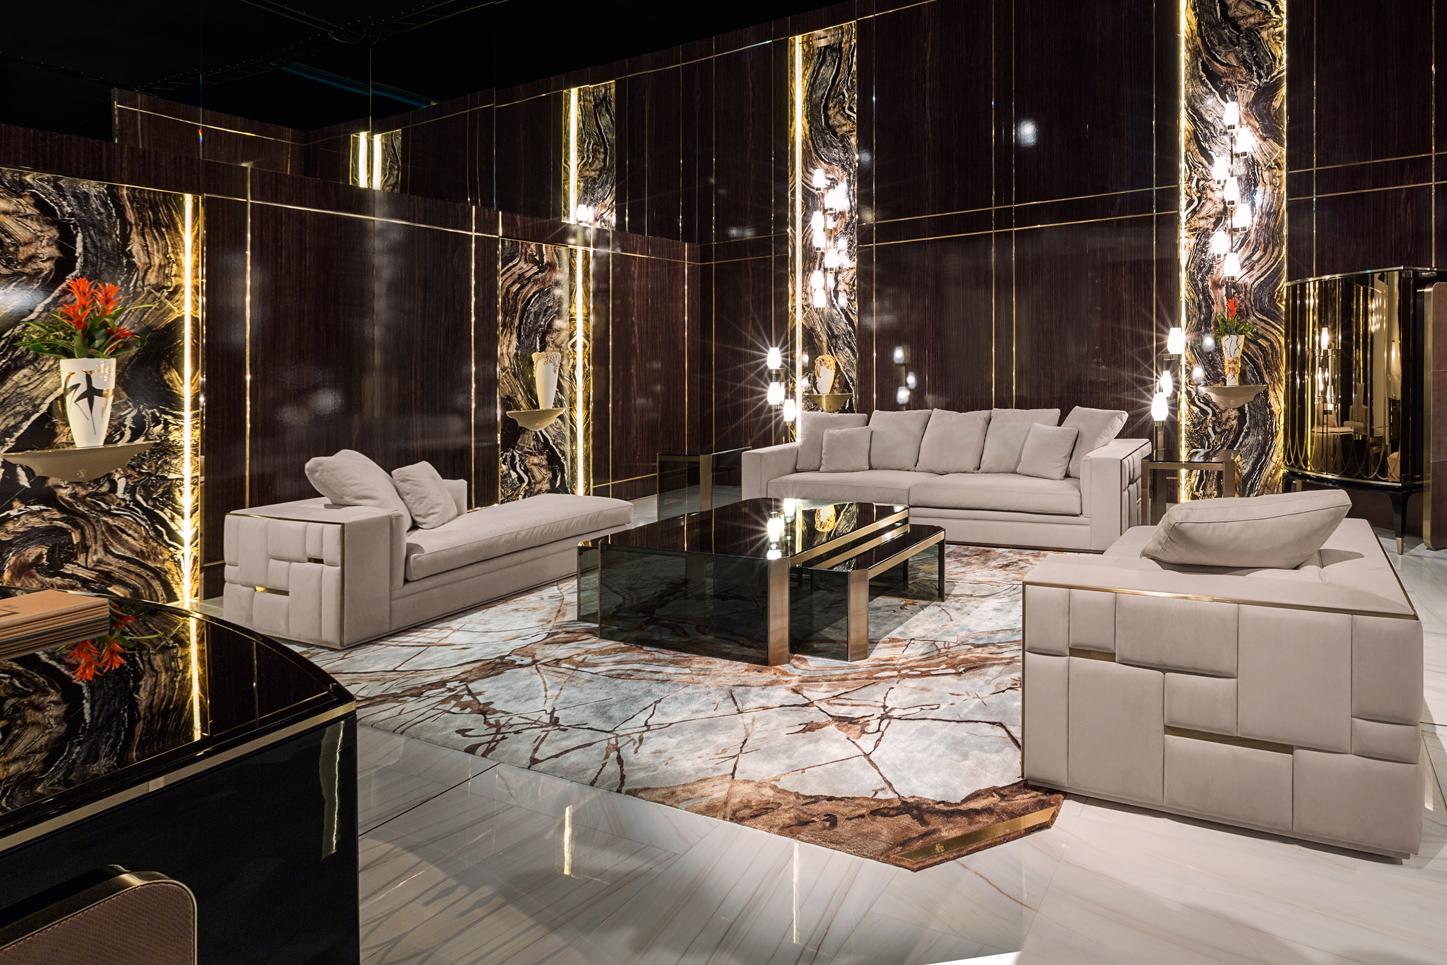 High End Luxury Furniture